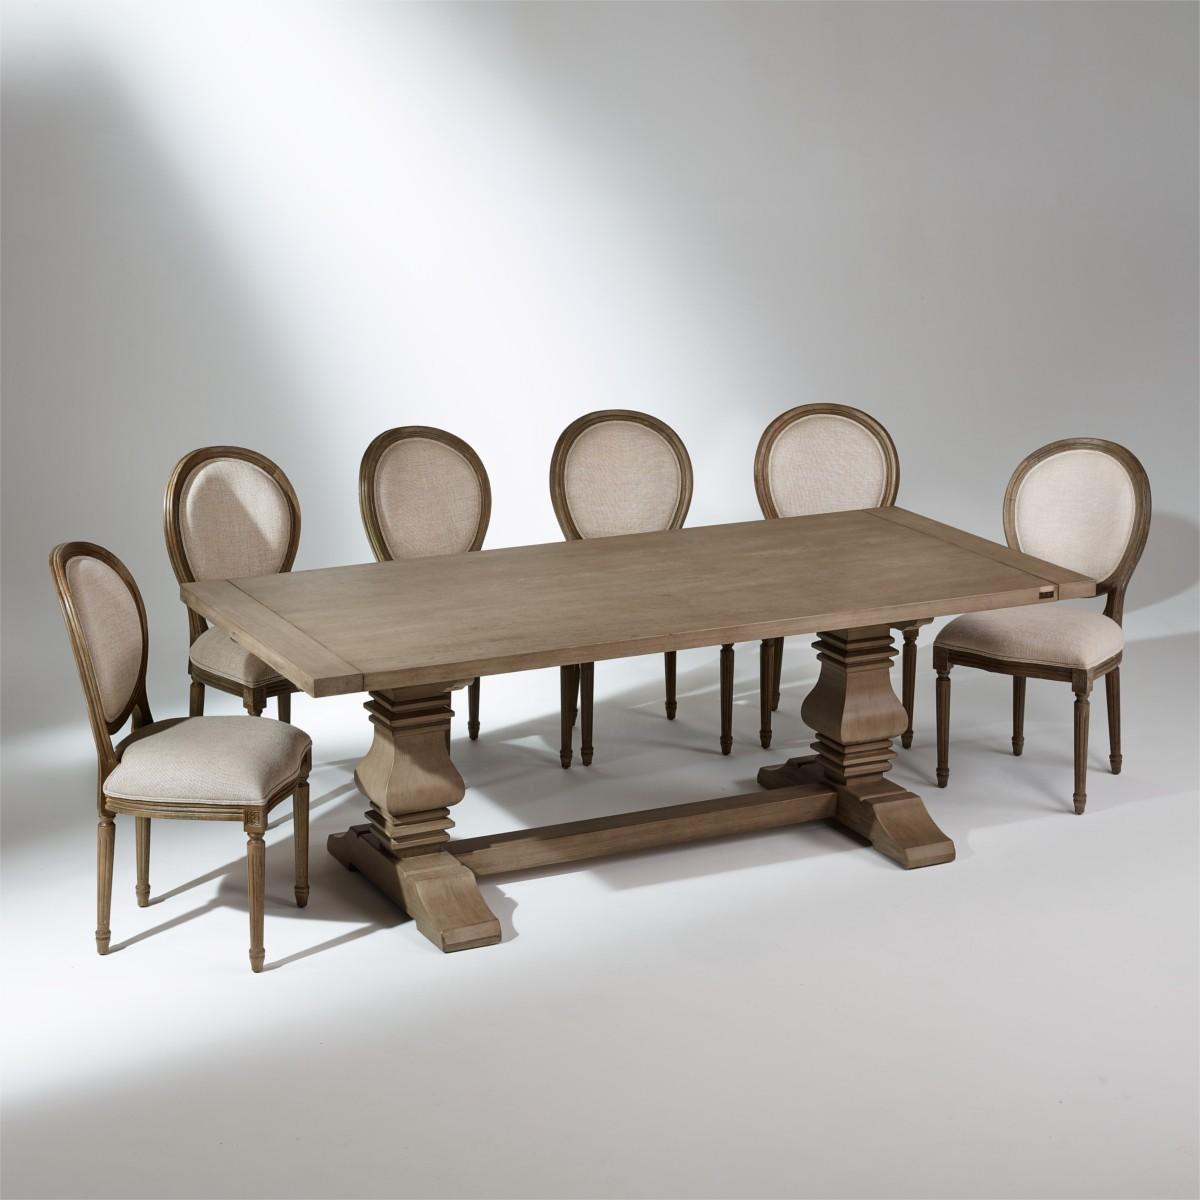 Table de salle manger rallonges penelope 10 14 couverts for Table de salle a manger 15 couverts